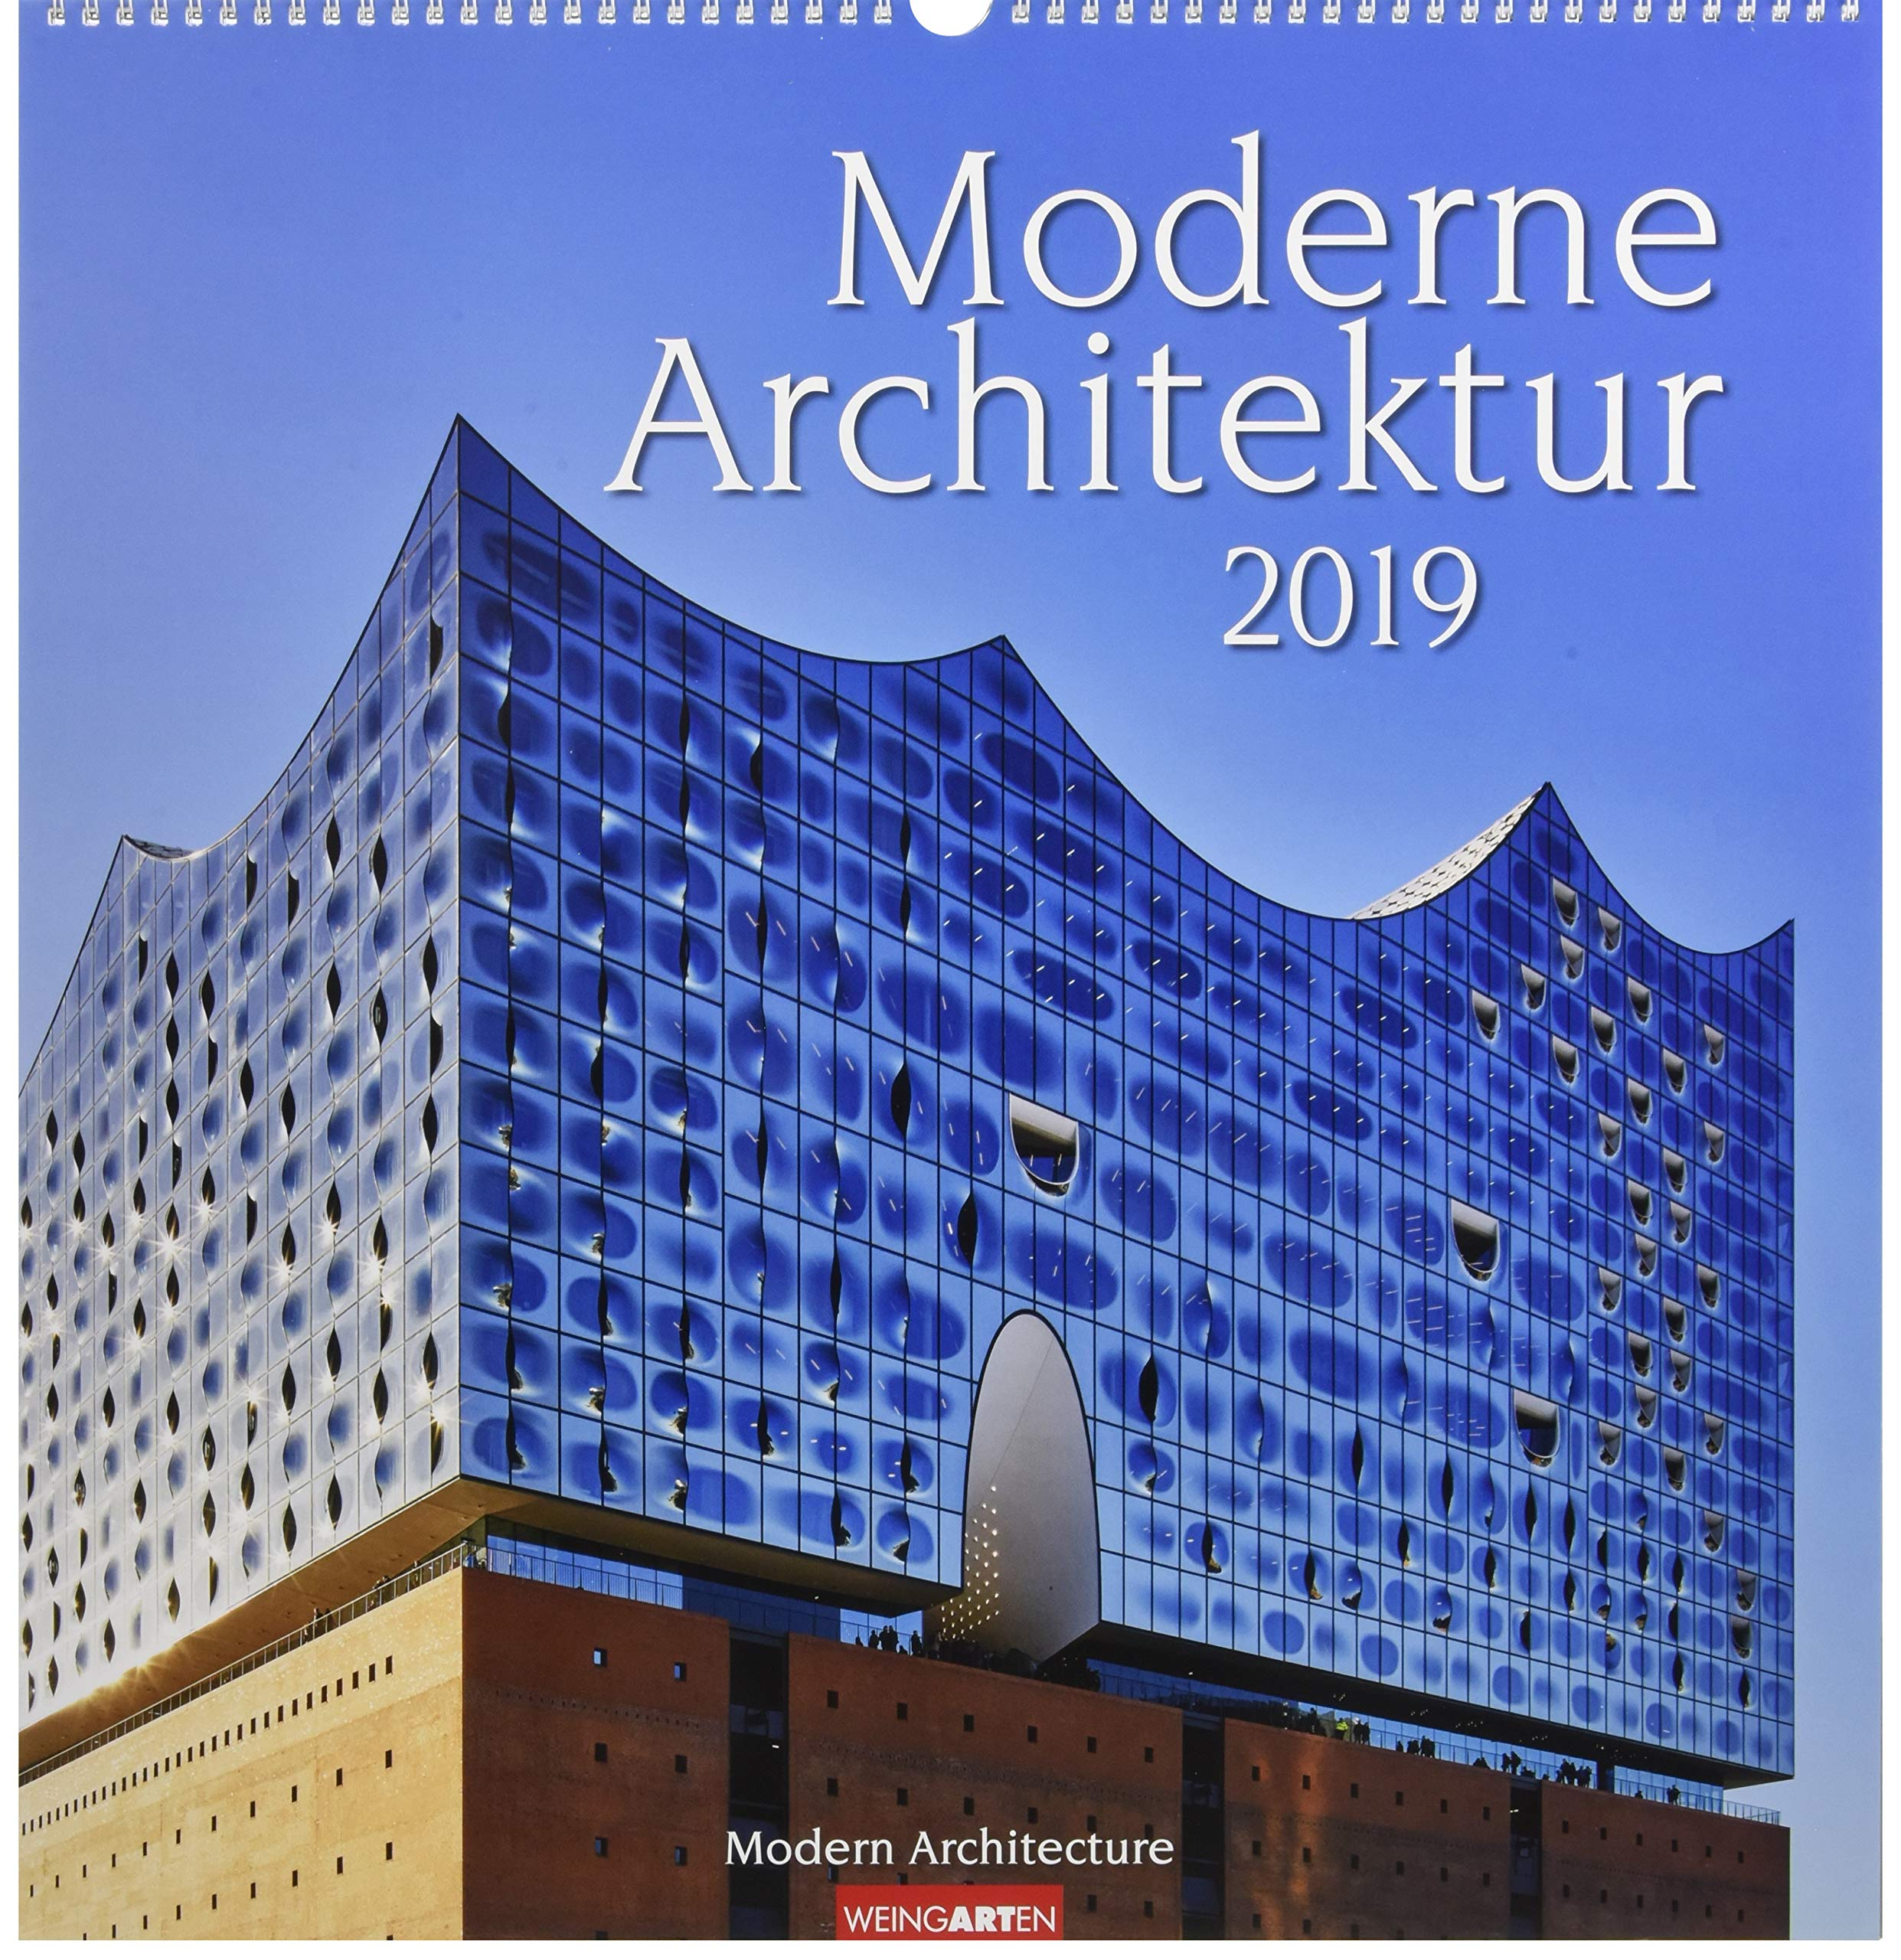 Moderne Architektur Kalender 2019 9783840073946 Amazon